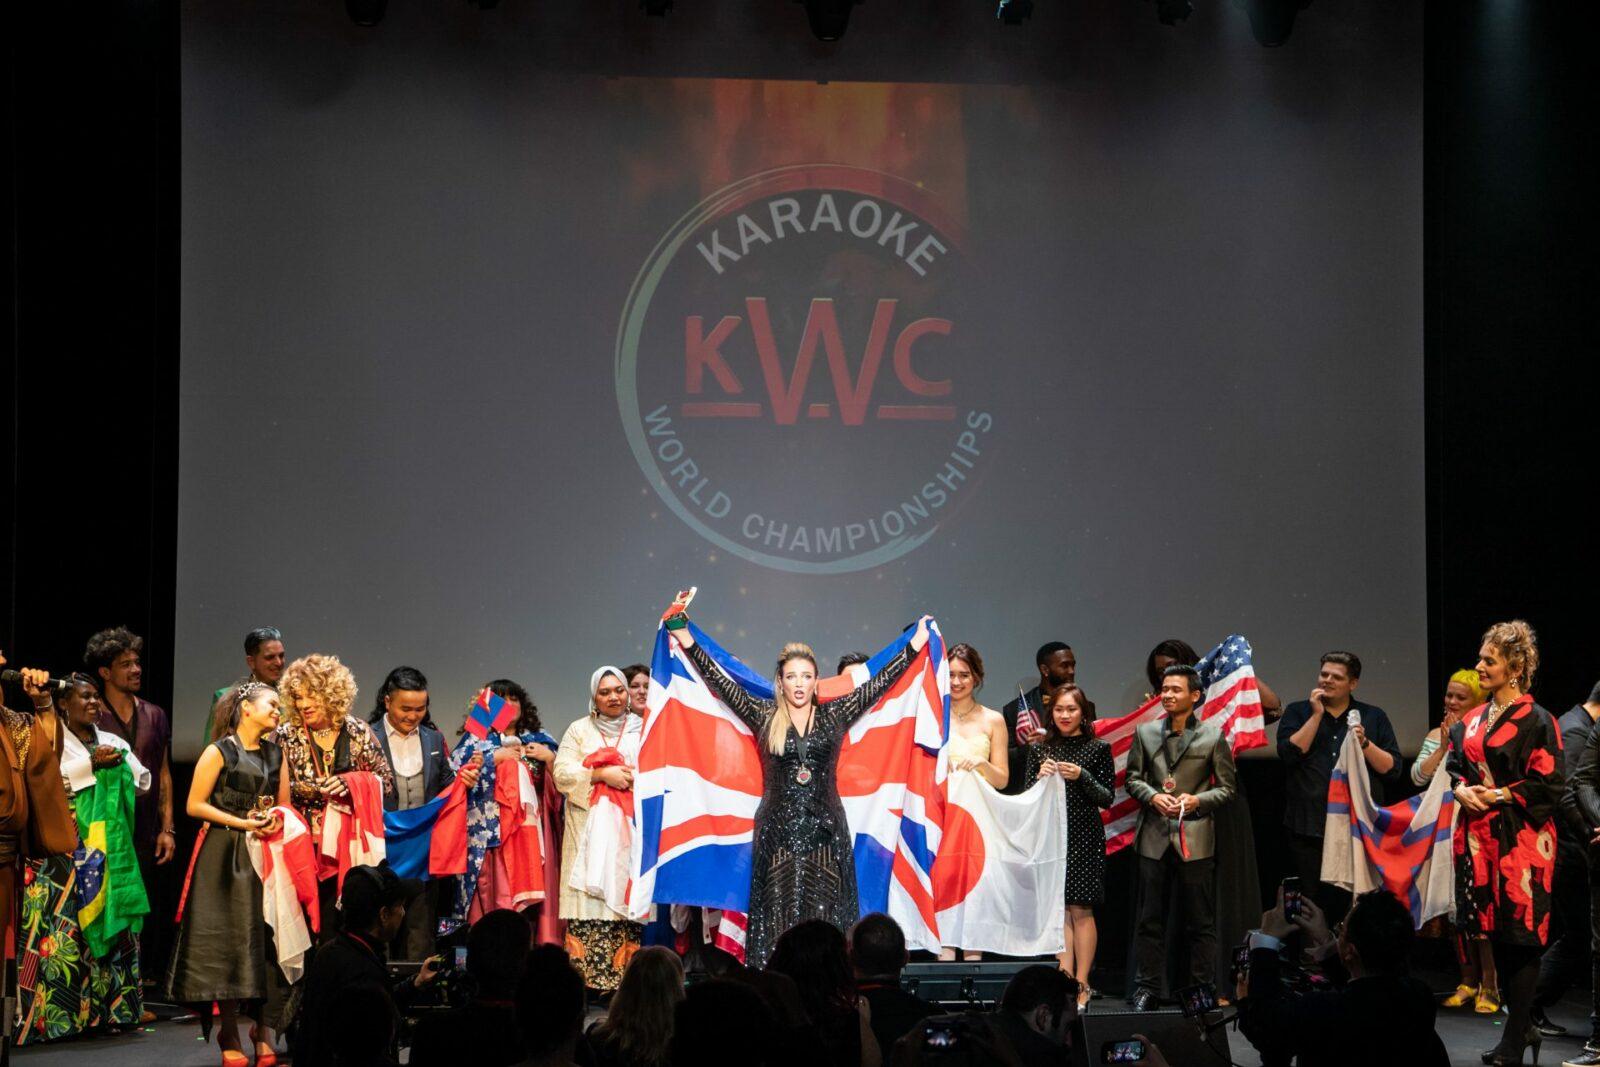 ugr 2632 - Anjo Sarnate Wins Viewer's Choice Award at the Karaoke World Championships